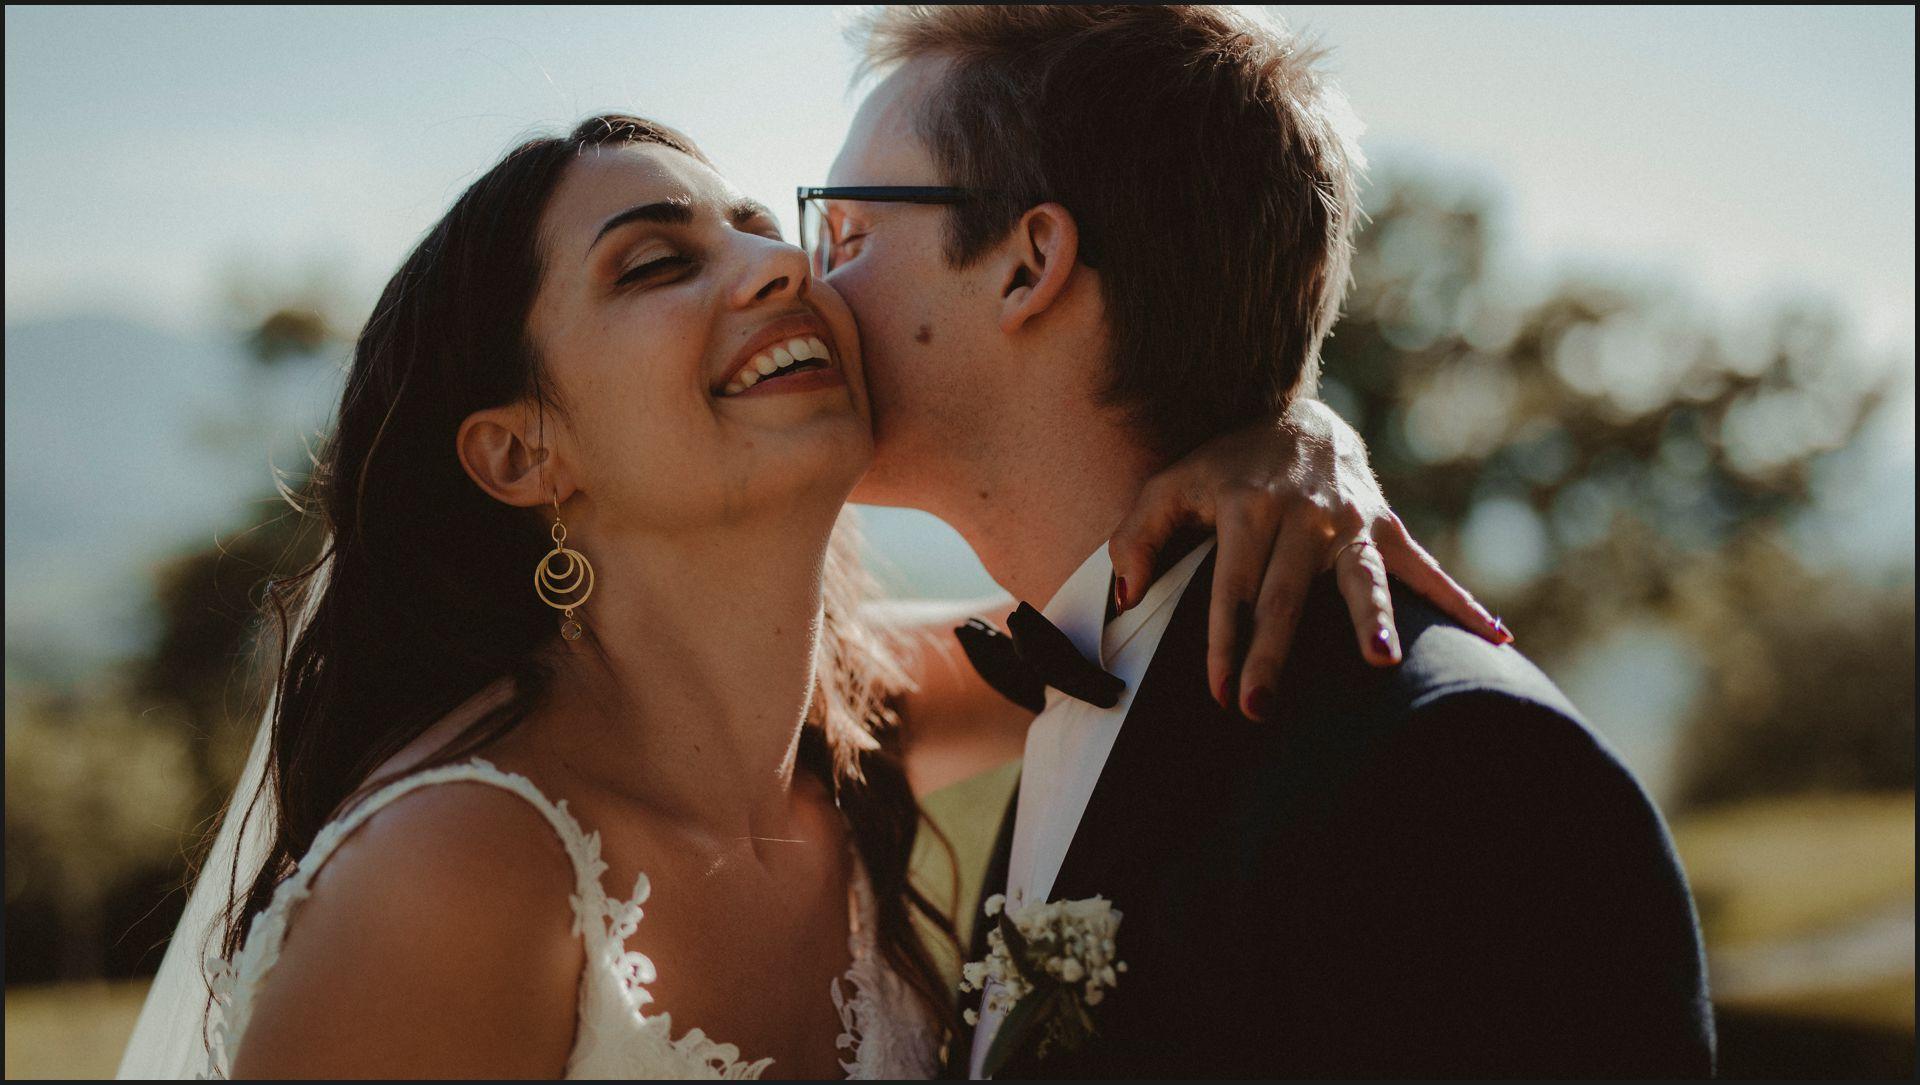 bride, groom, romantic, wedding, nikis resort, umbria, love